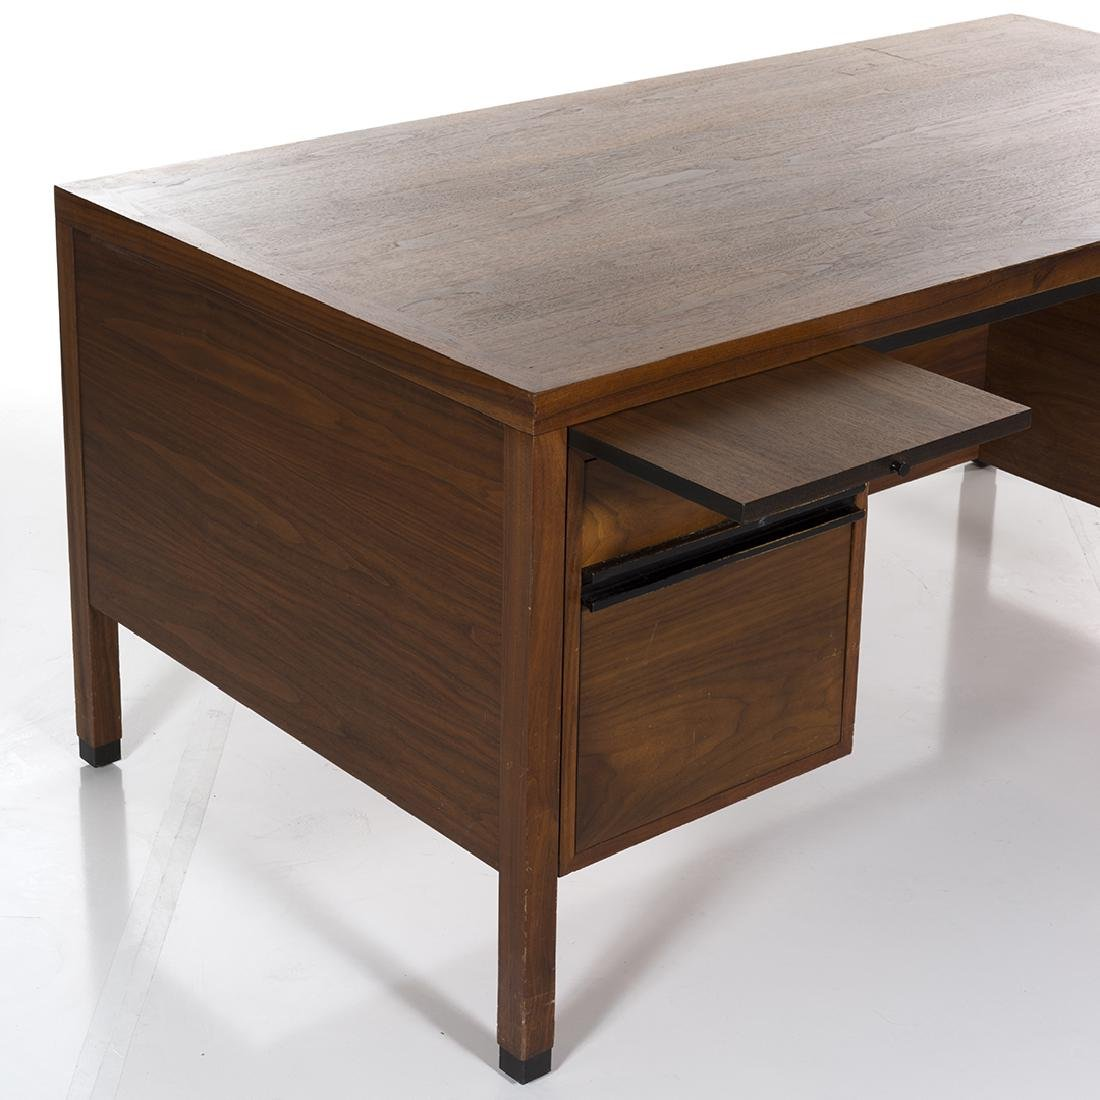 Directional Executive Desk - 6